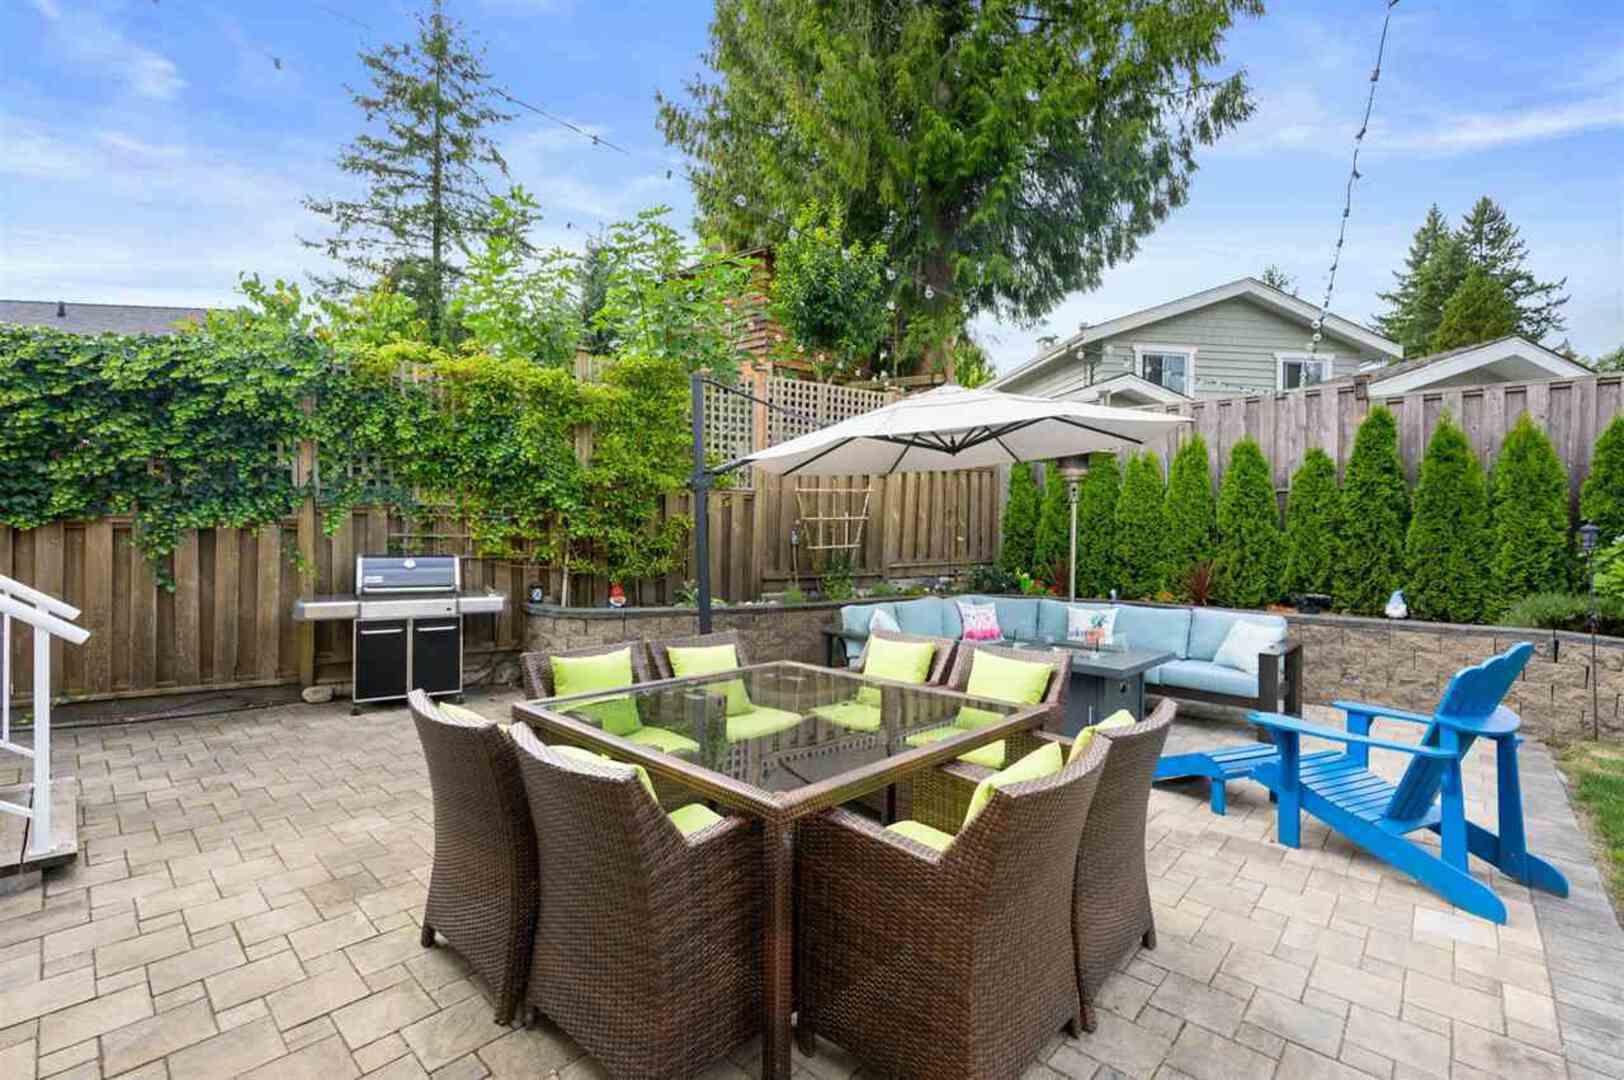 2808-trillium-place-blueridge-nv-north-vancouver-33 at 2808 Trillium Place, Blueridge NV, North Vancouver